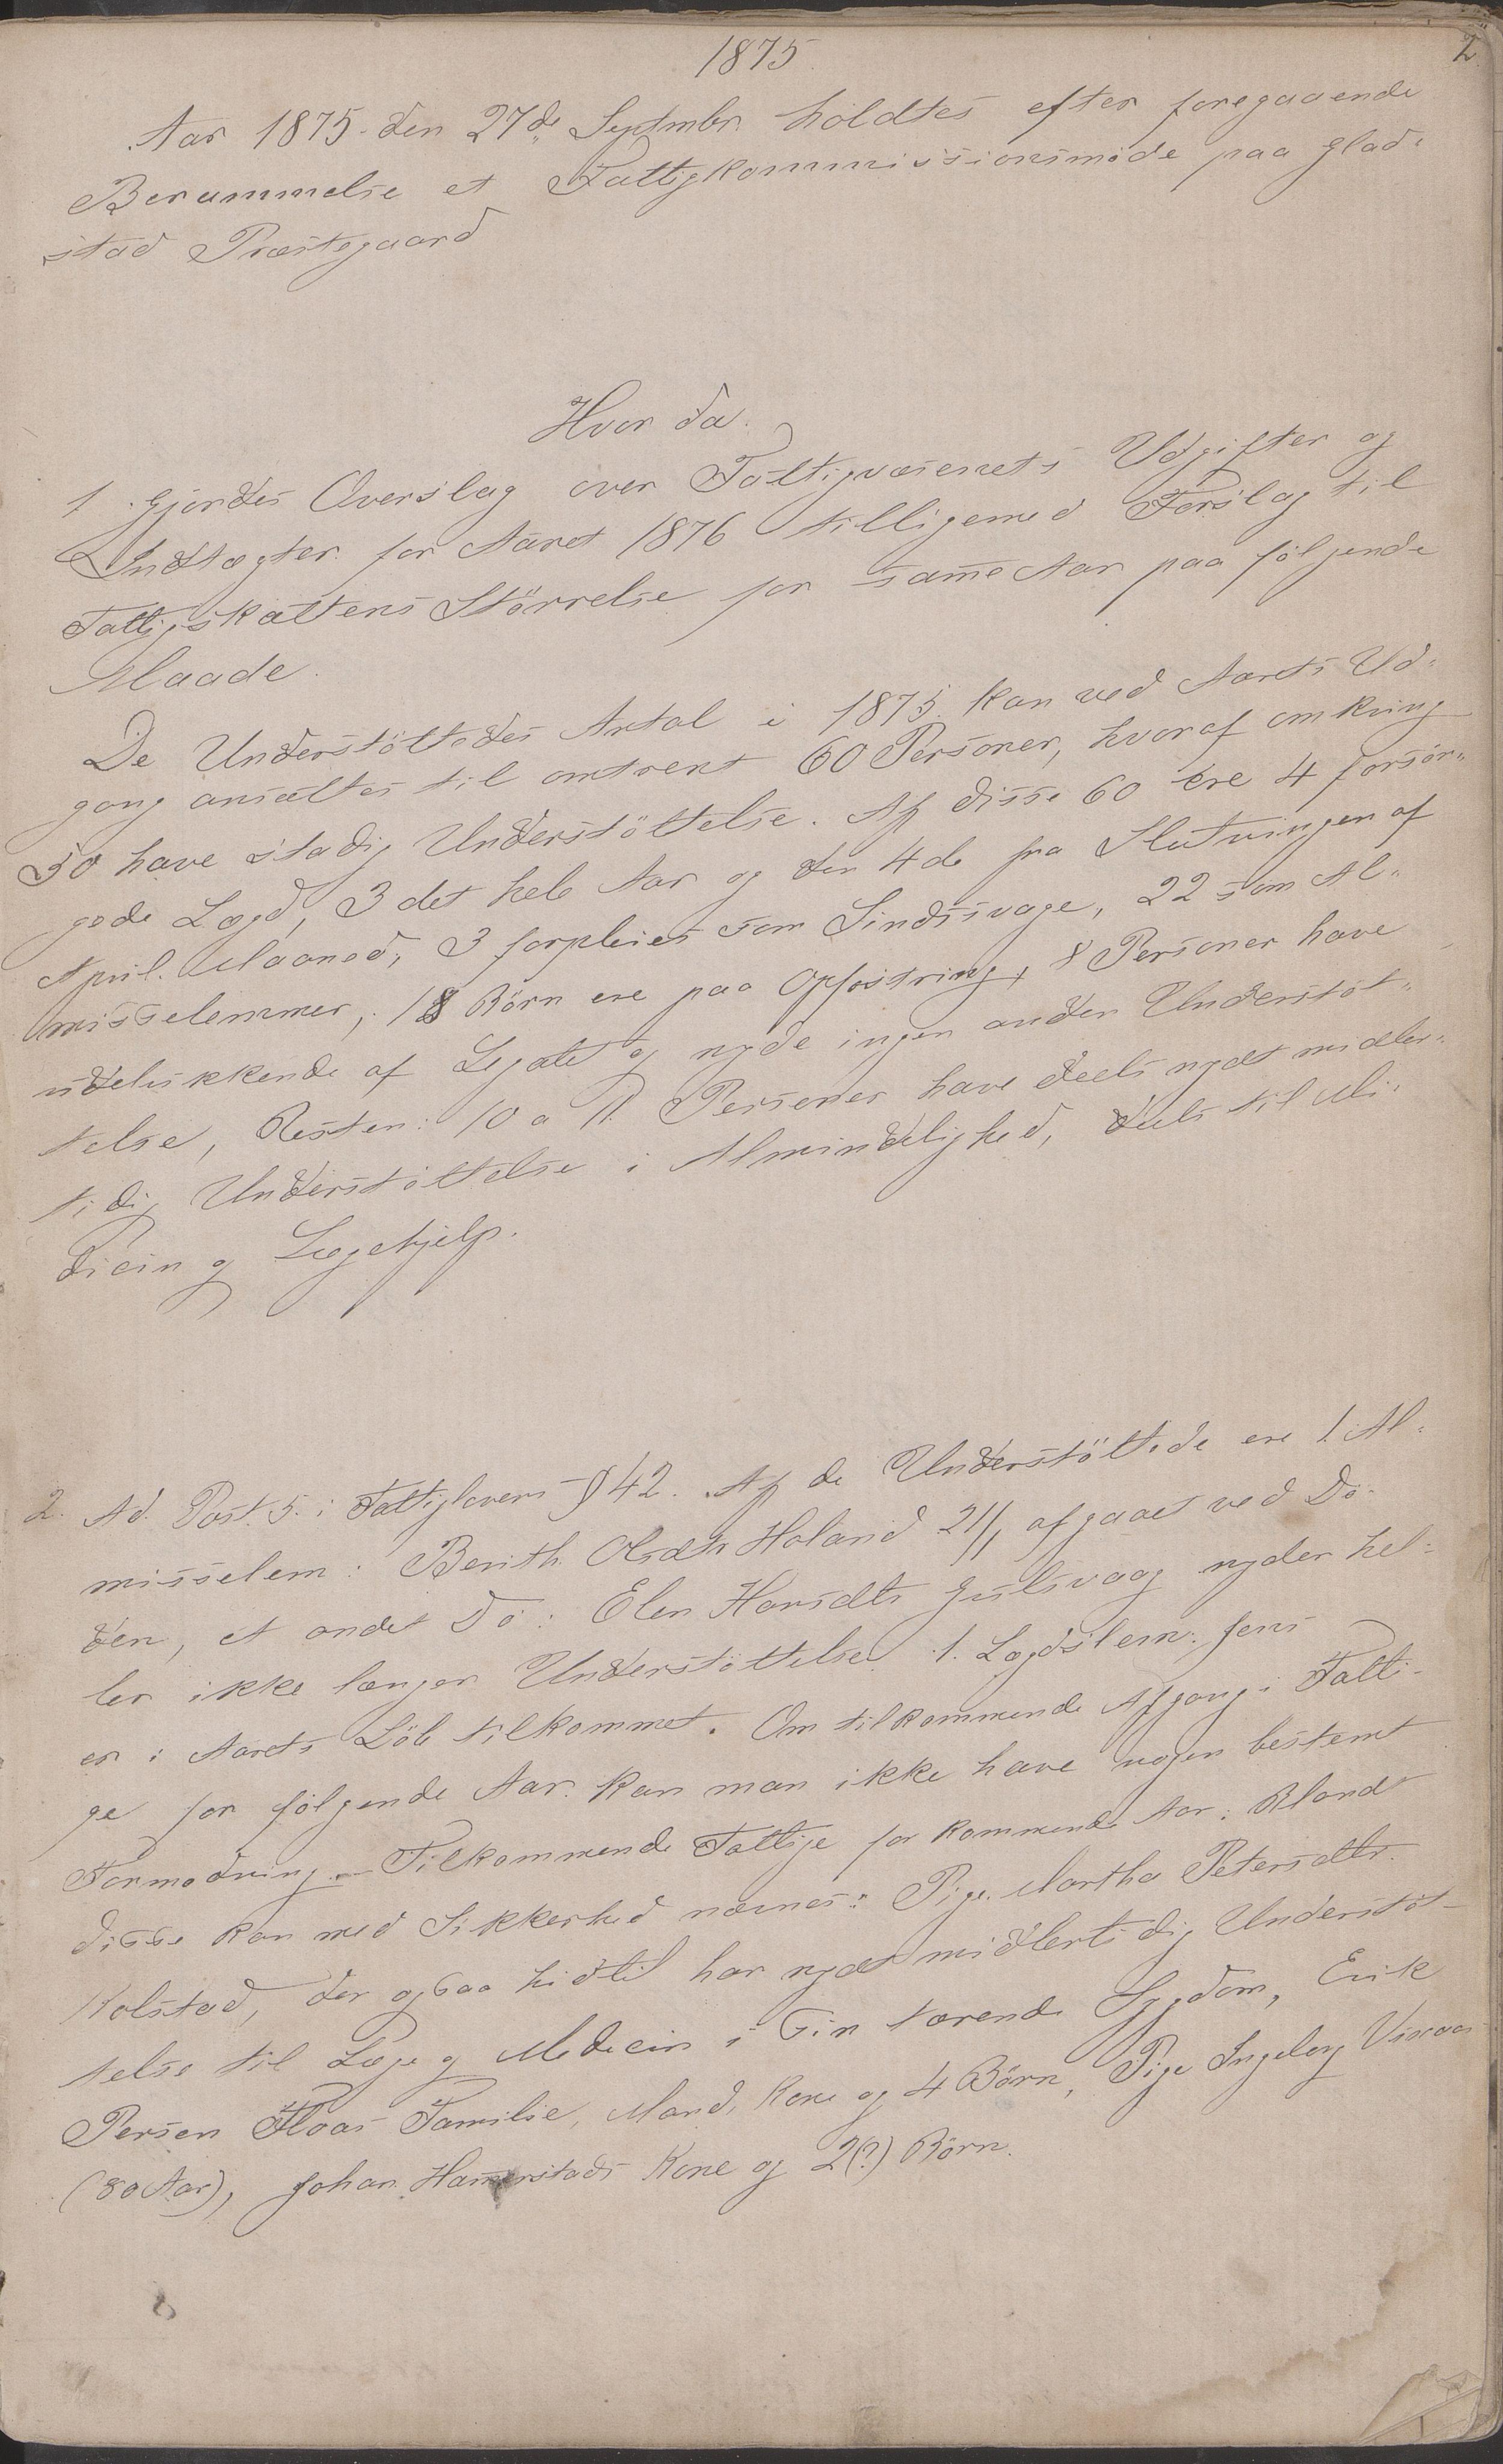 AIN, Vega kommune. Fattigstyret, A/L0002: Forhandlingsprotokoll, 1875-1889, s. 2